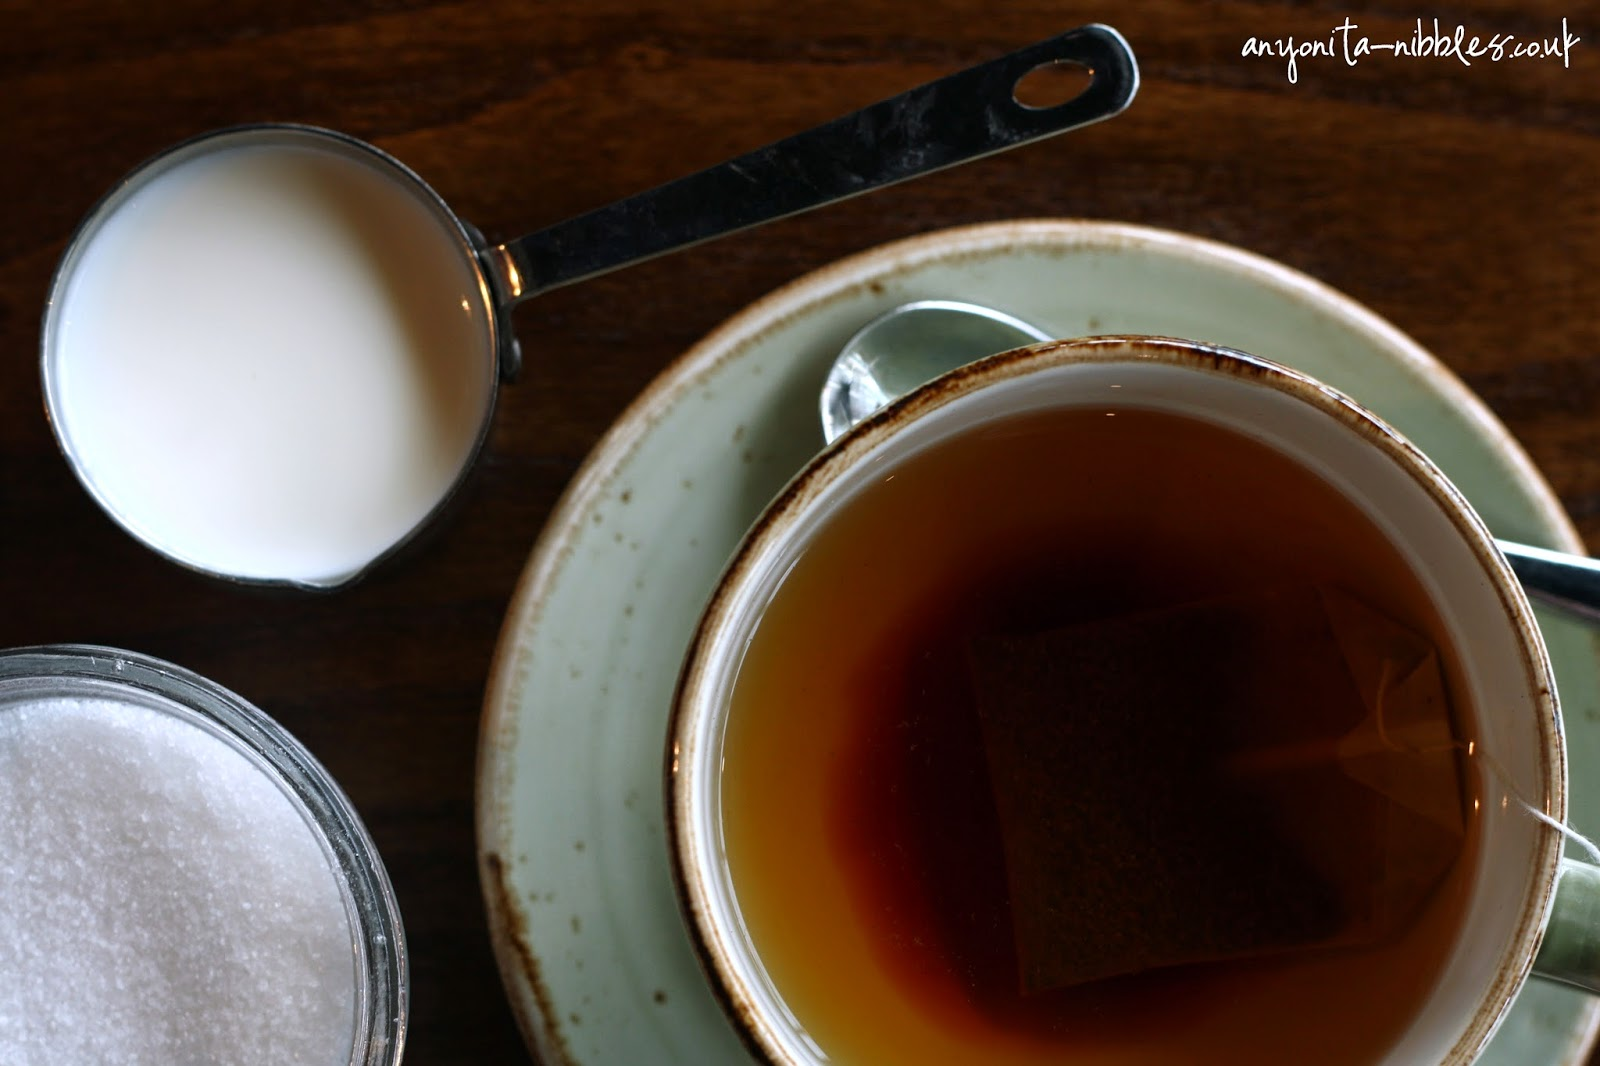 Tea's up for breakfast at TGI Friday's | Anyonita-nibbles.co.uk